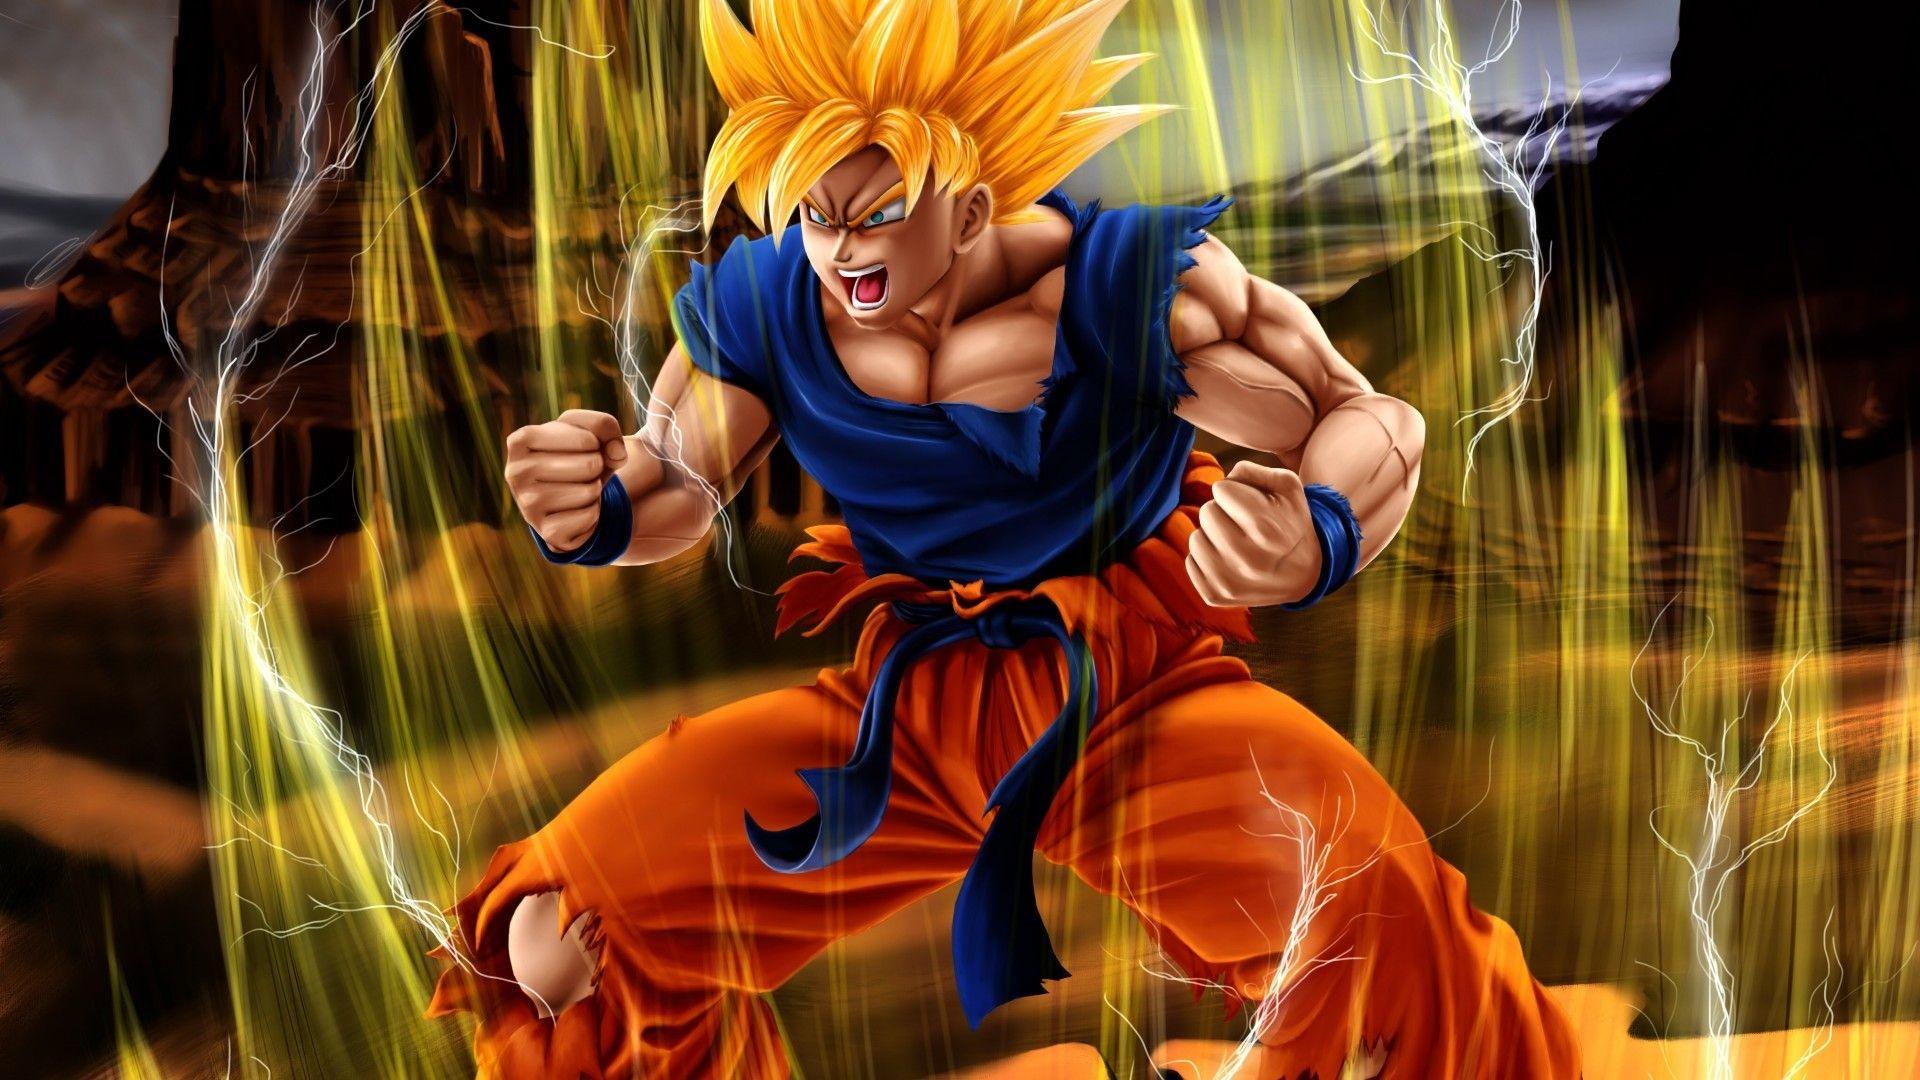 Goku Super Saiyan Wallpaper